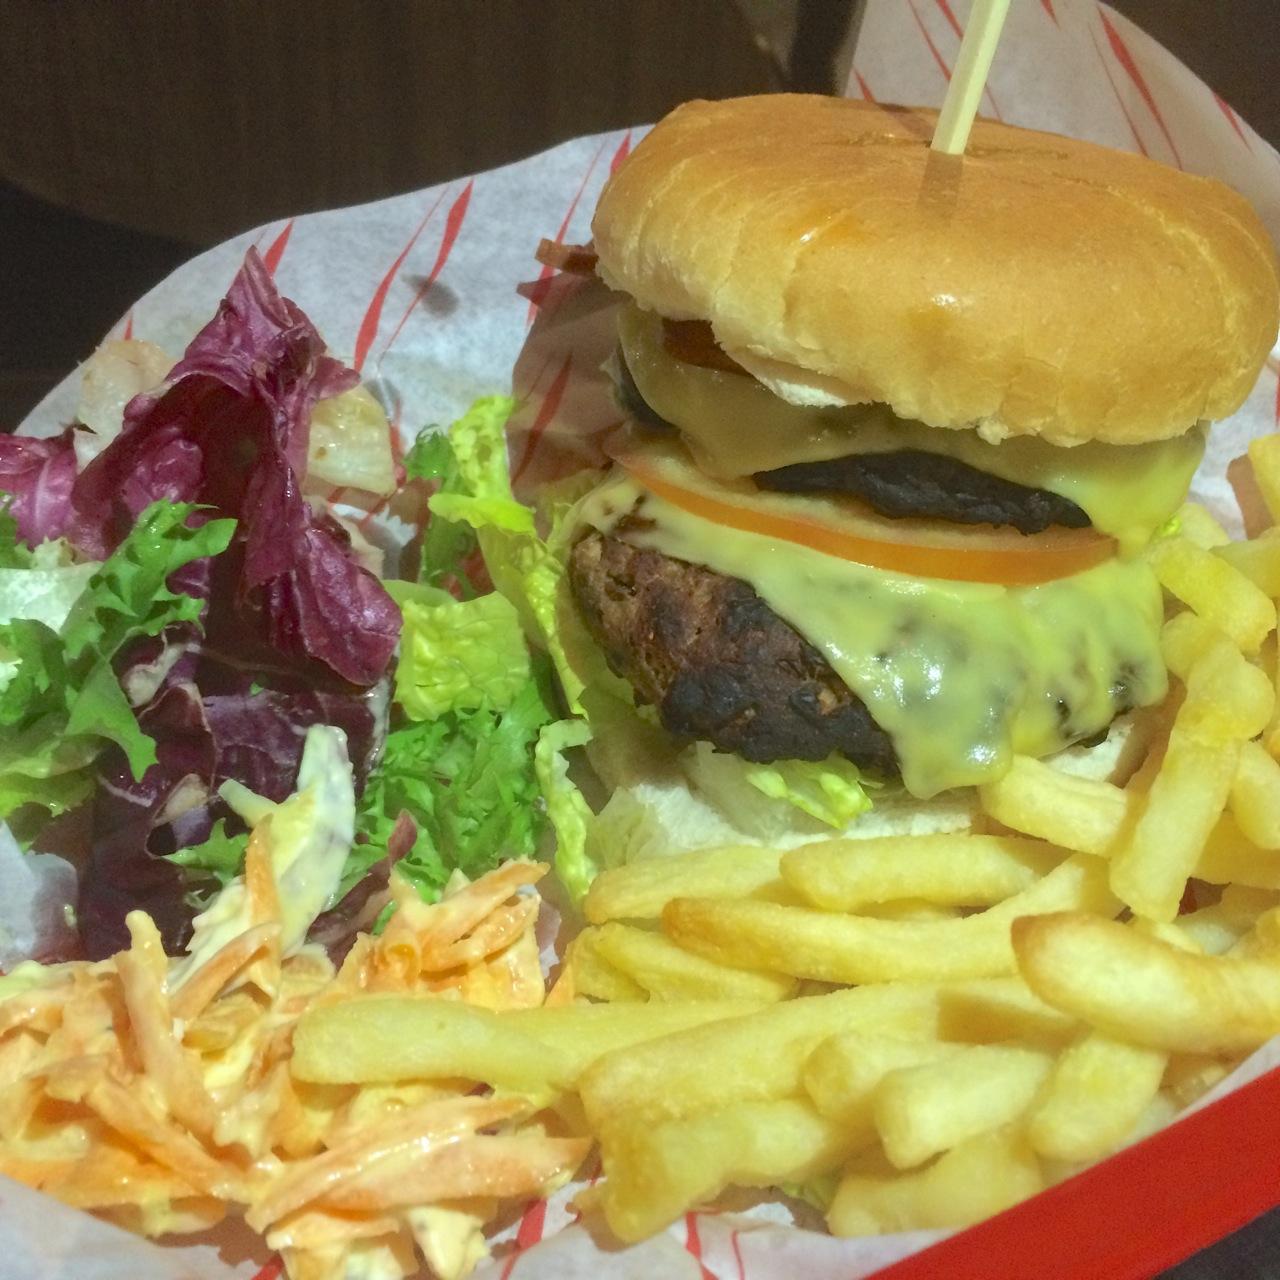 http://fatgayvegan.com/wp-content/uploads/2016/01/burger.jpg